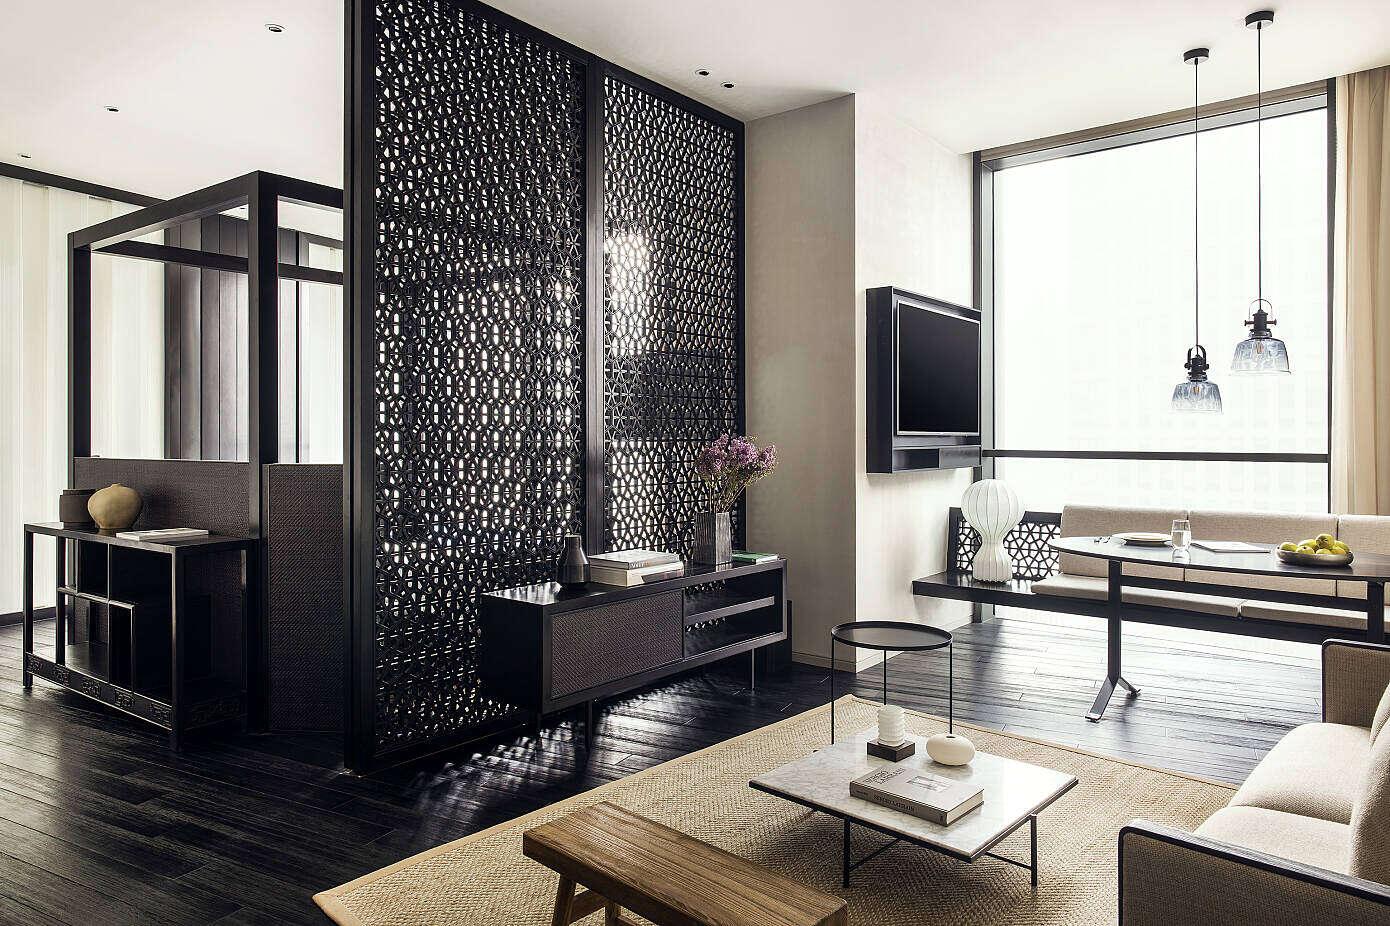 The Middle House by Lissoni Associati / Lissoni Architettura